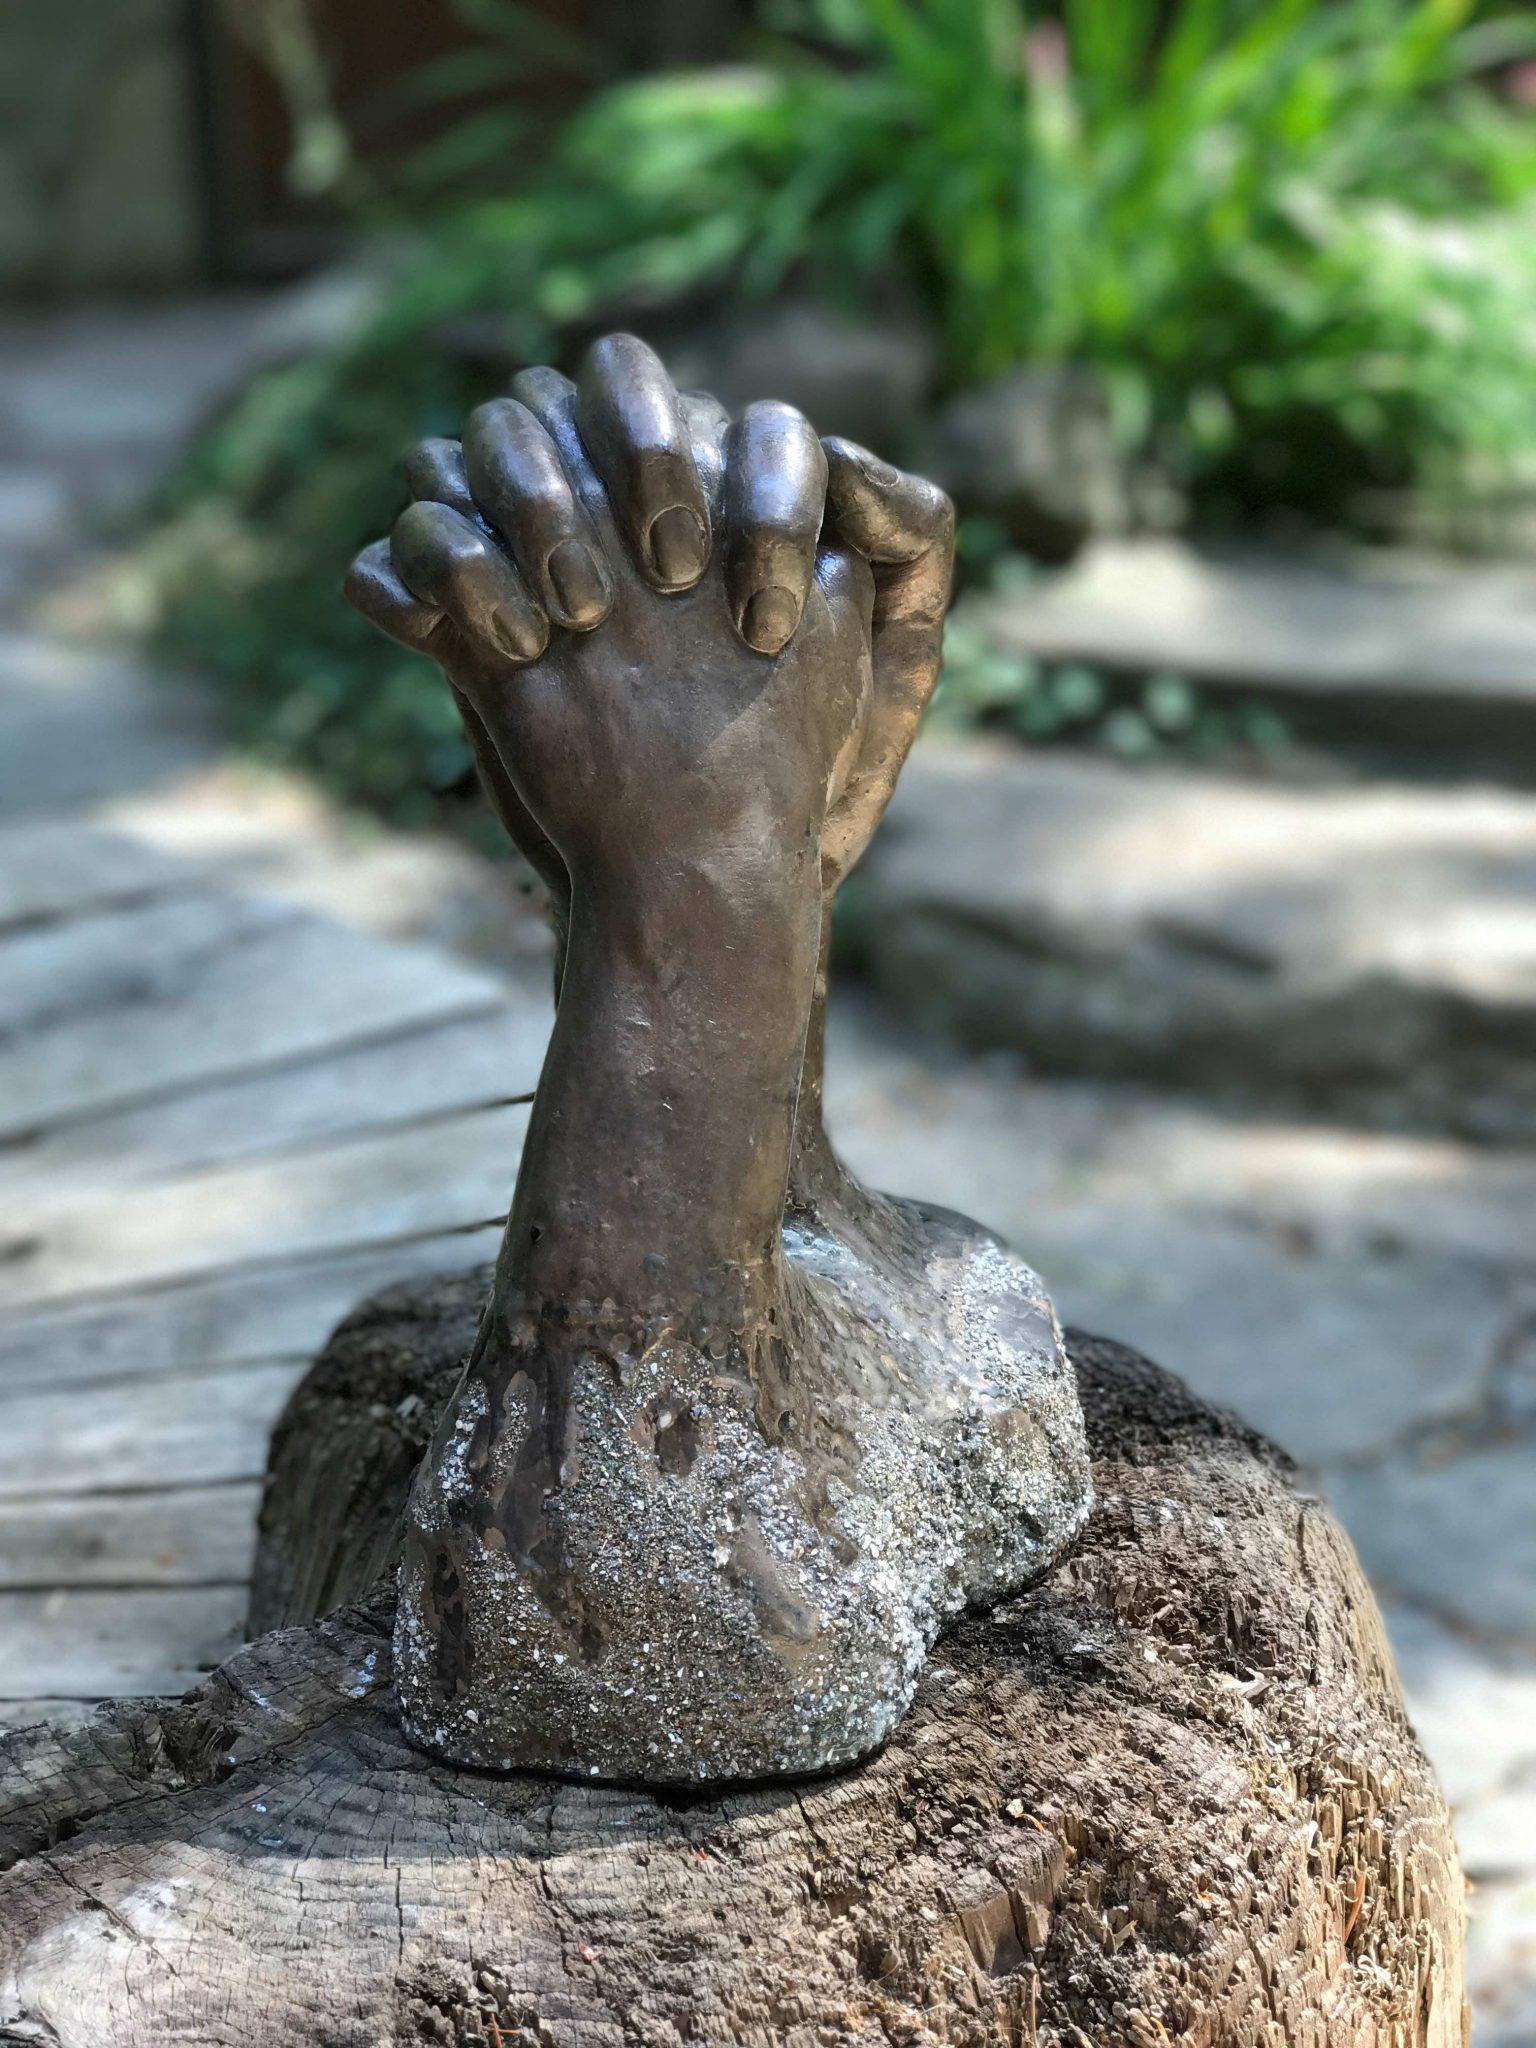 LifeCasts - Hands, Family, Baby, Torsos - StephenColeFineArt